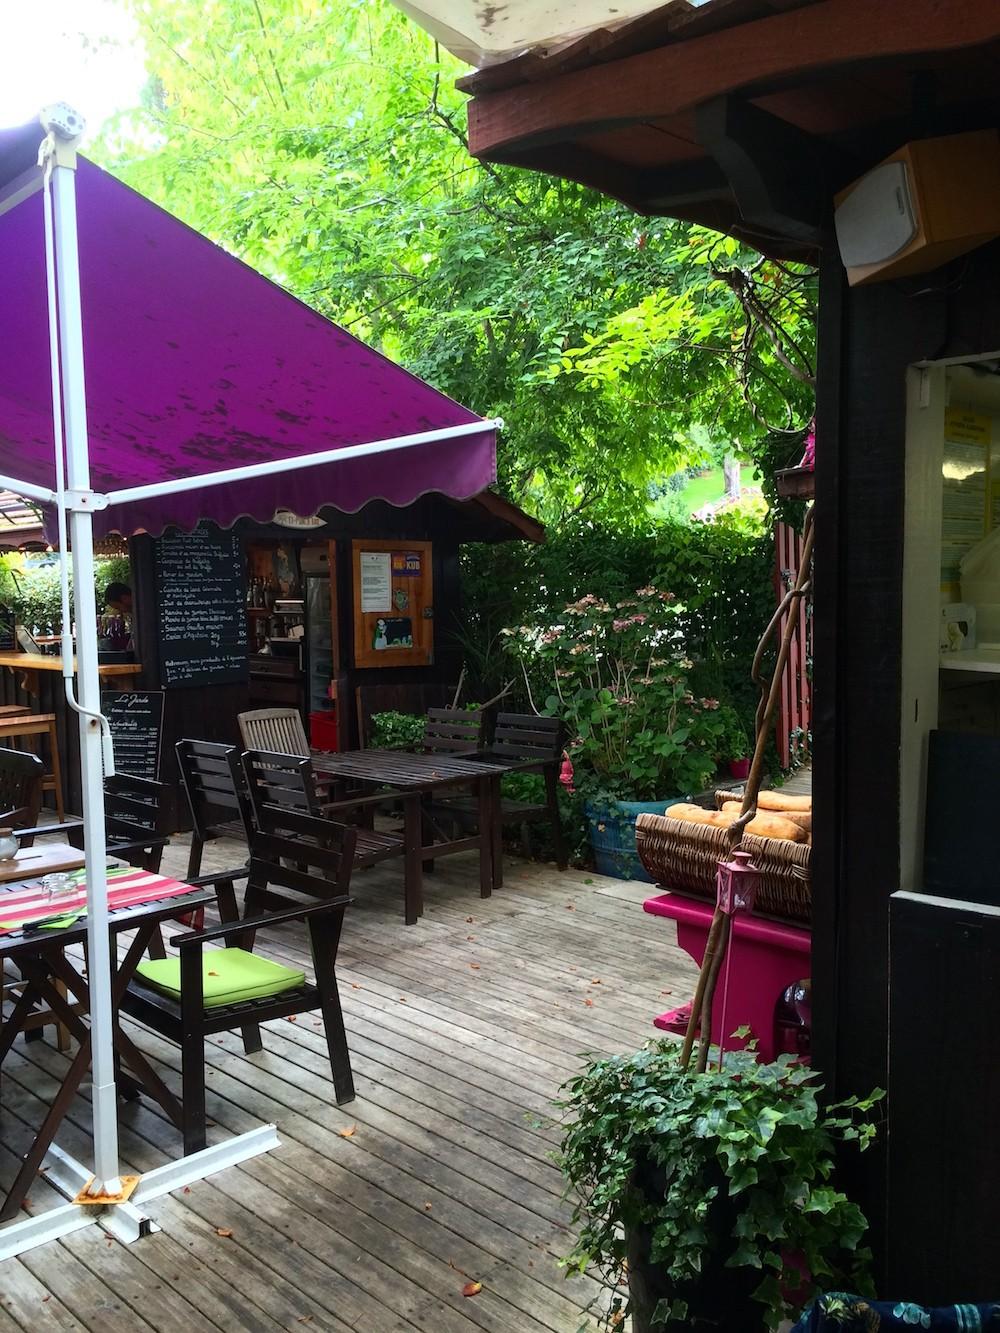 Belle vie blog enfin moi mode lifestyle bordeaux for Jardin o jardin